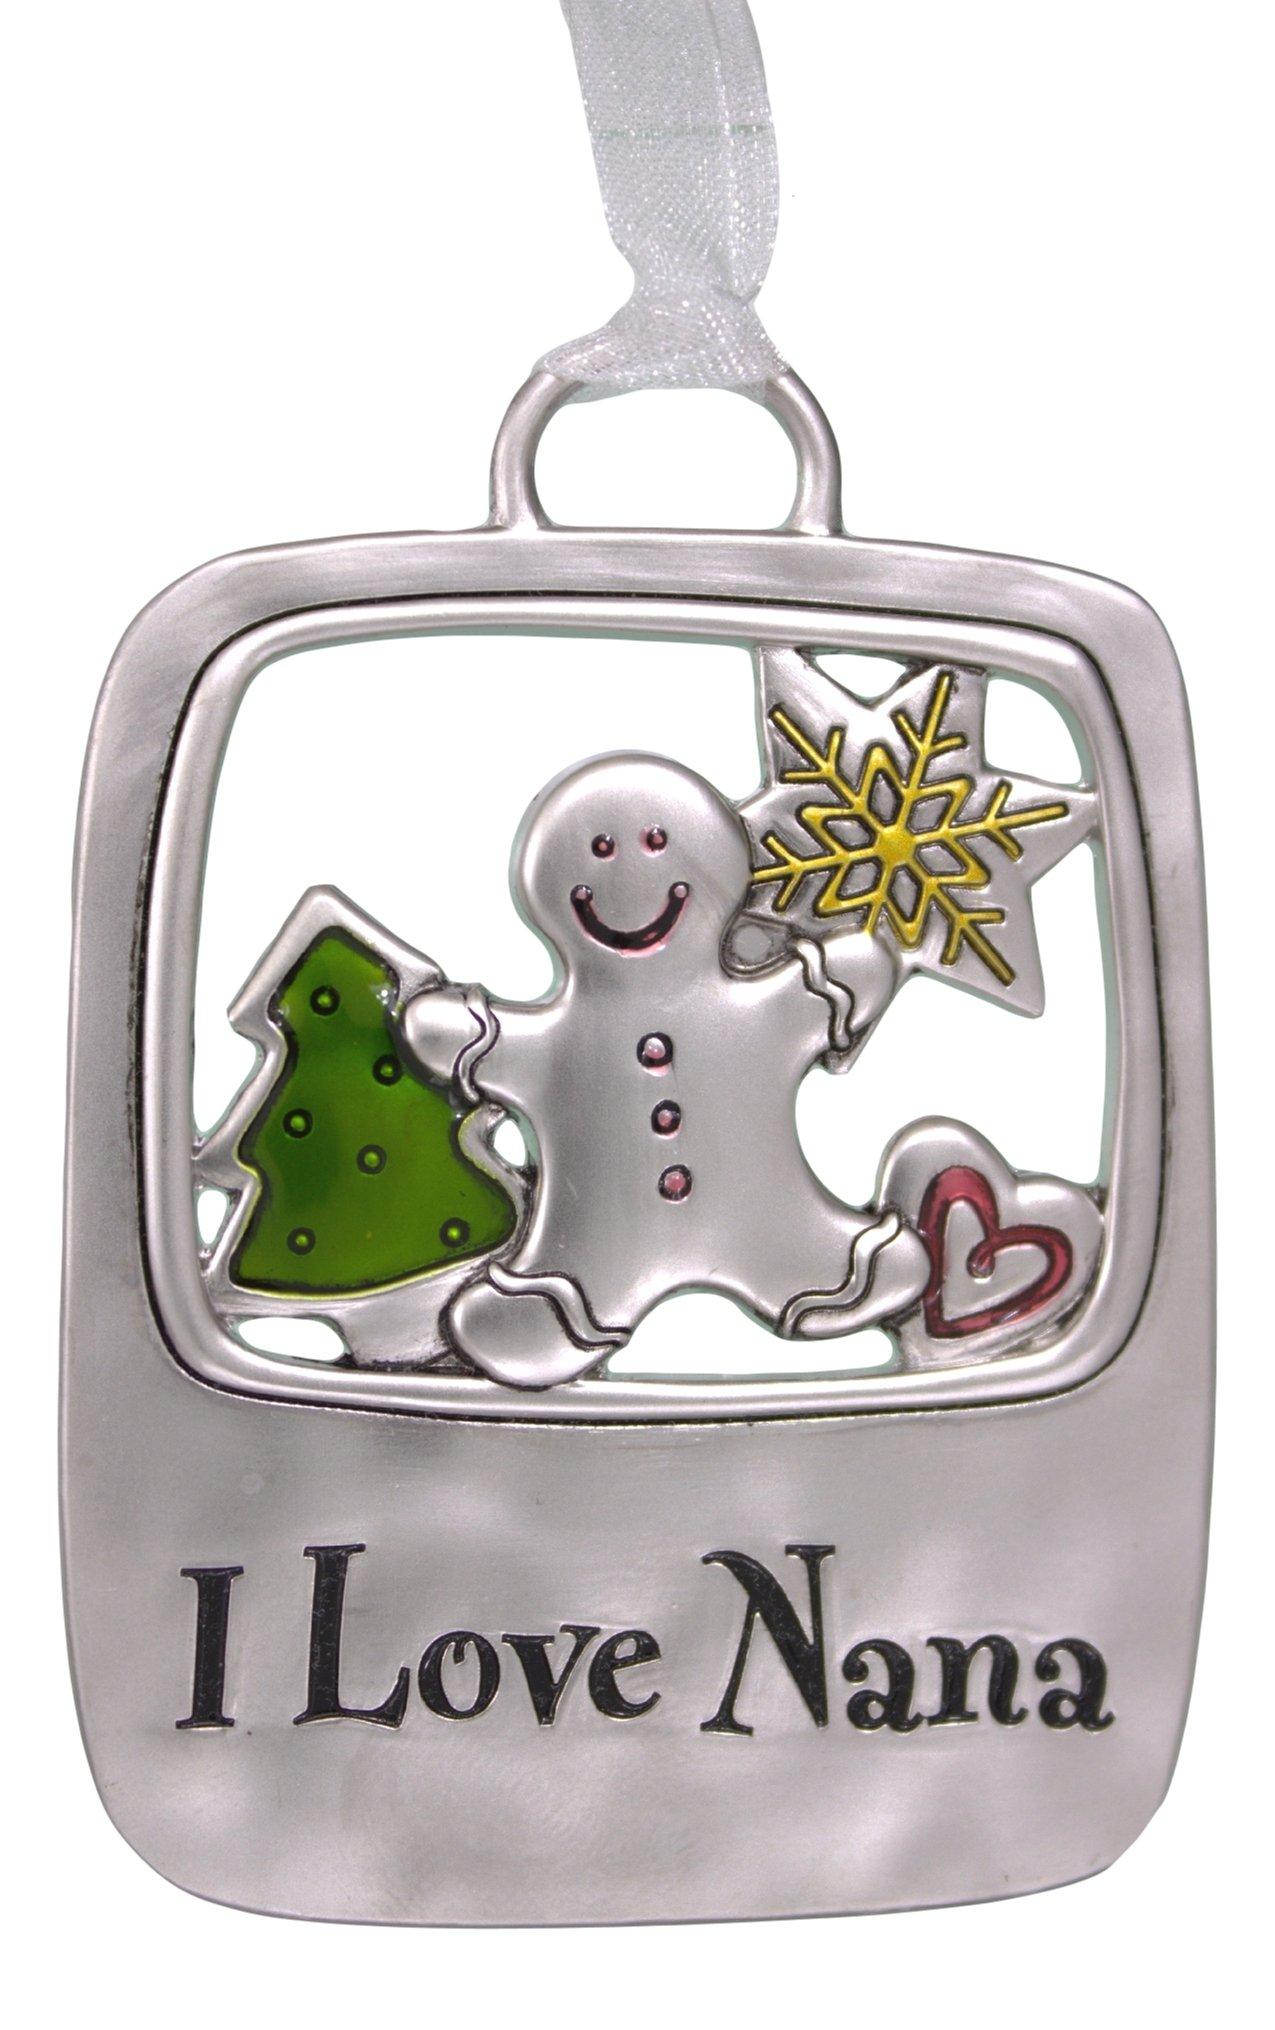 Tidings of the Season Ornament (I Love Nana)